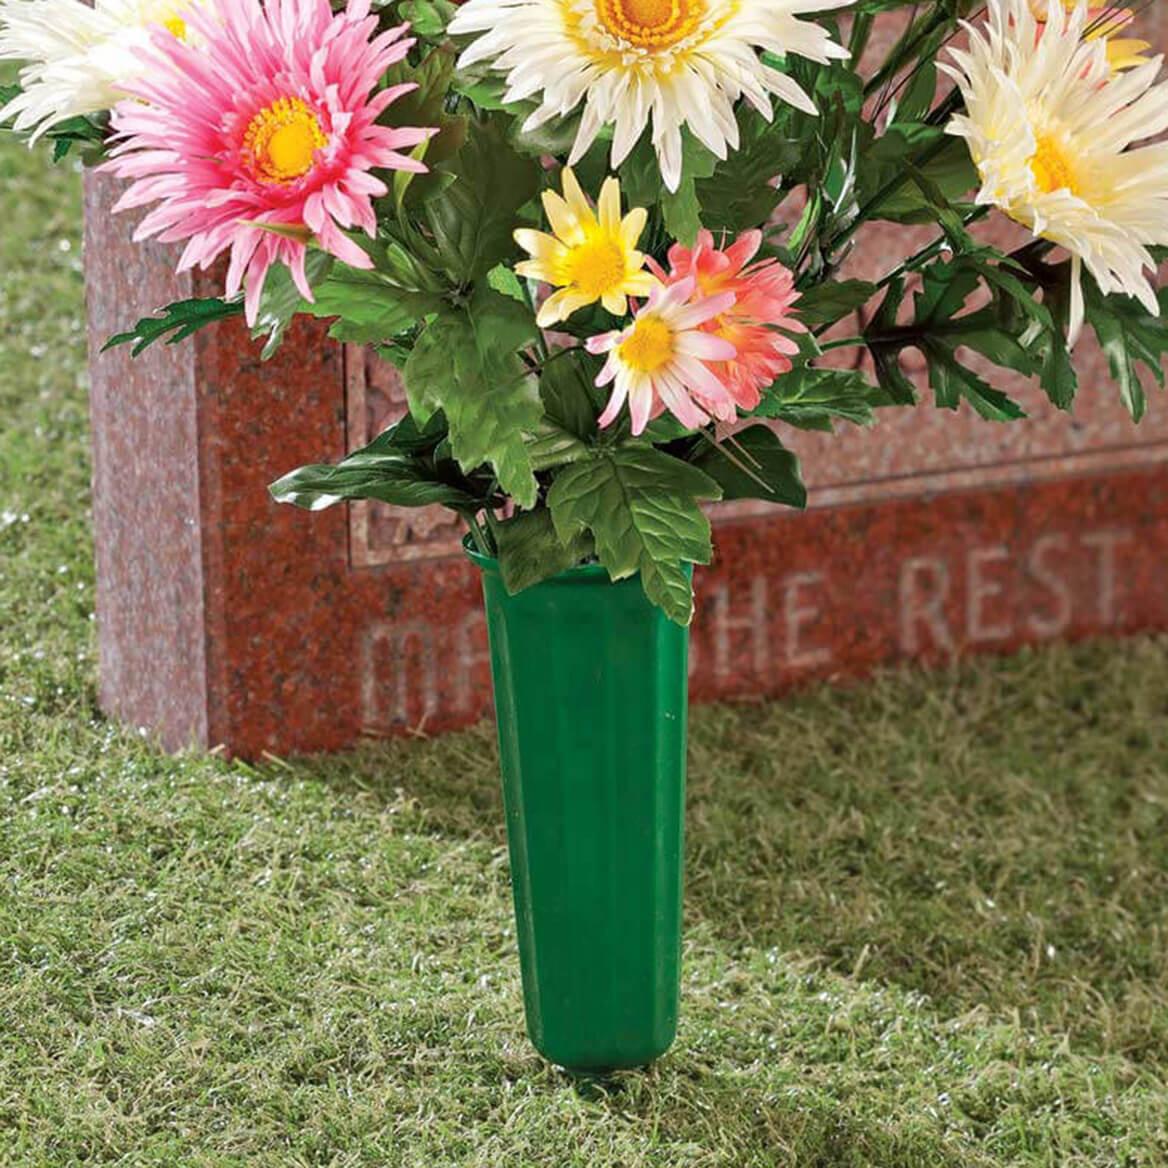 cemetery vase flowers of in ground cemetery vases pics vases for cemetery flowers vase and throughout in ground cemetery vases pics vases for cemetery flowers vase and cellar image avorcor